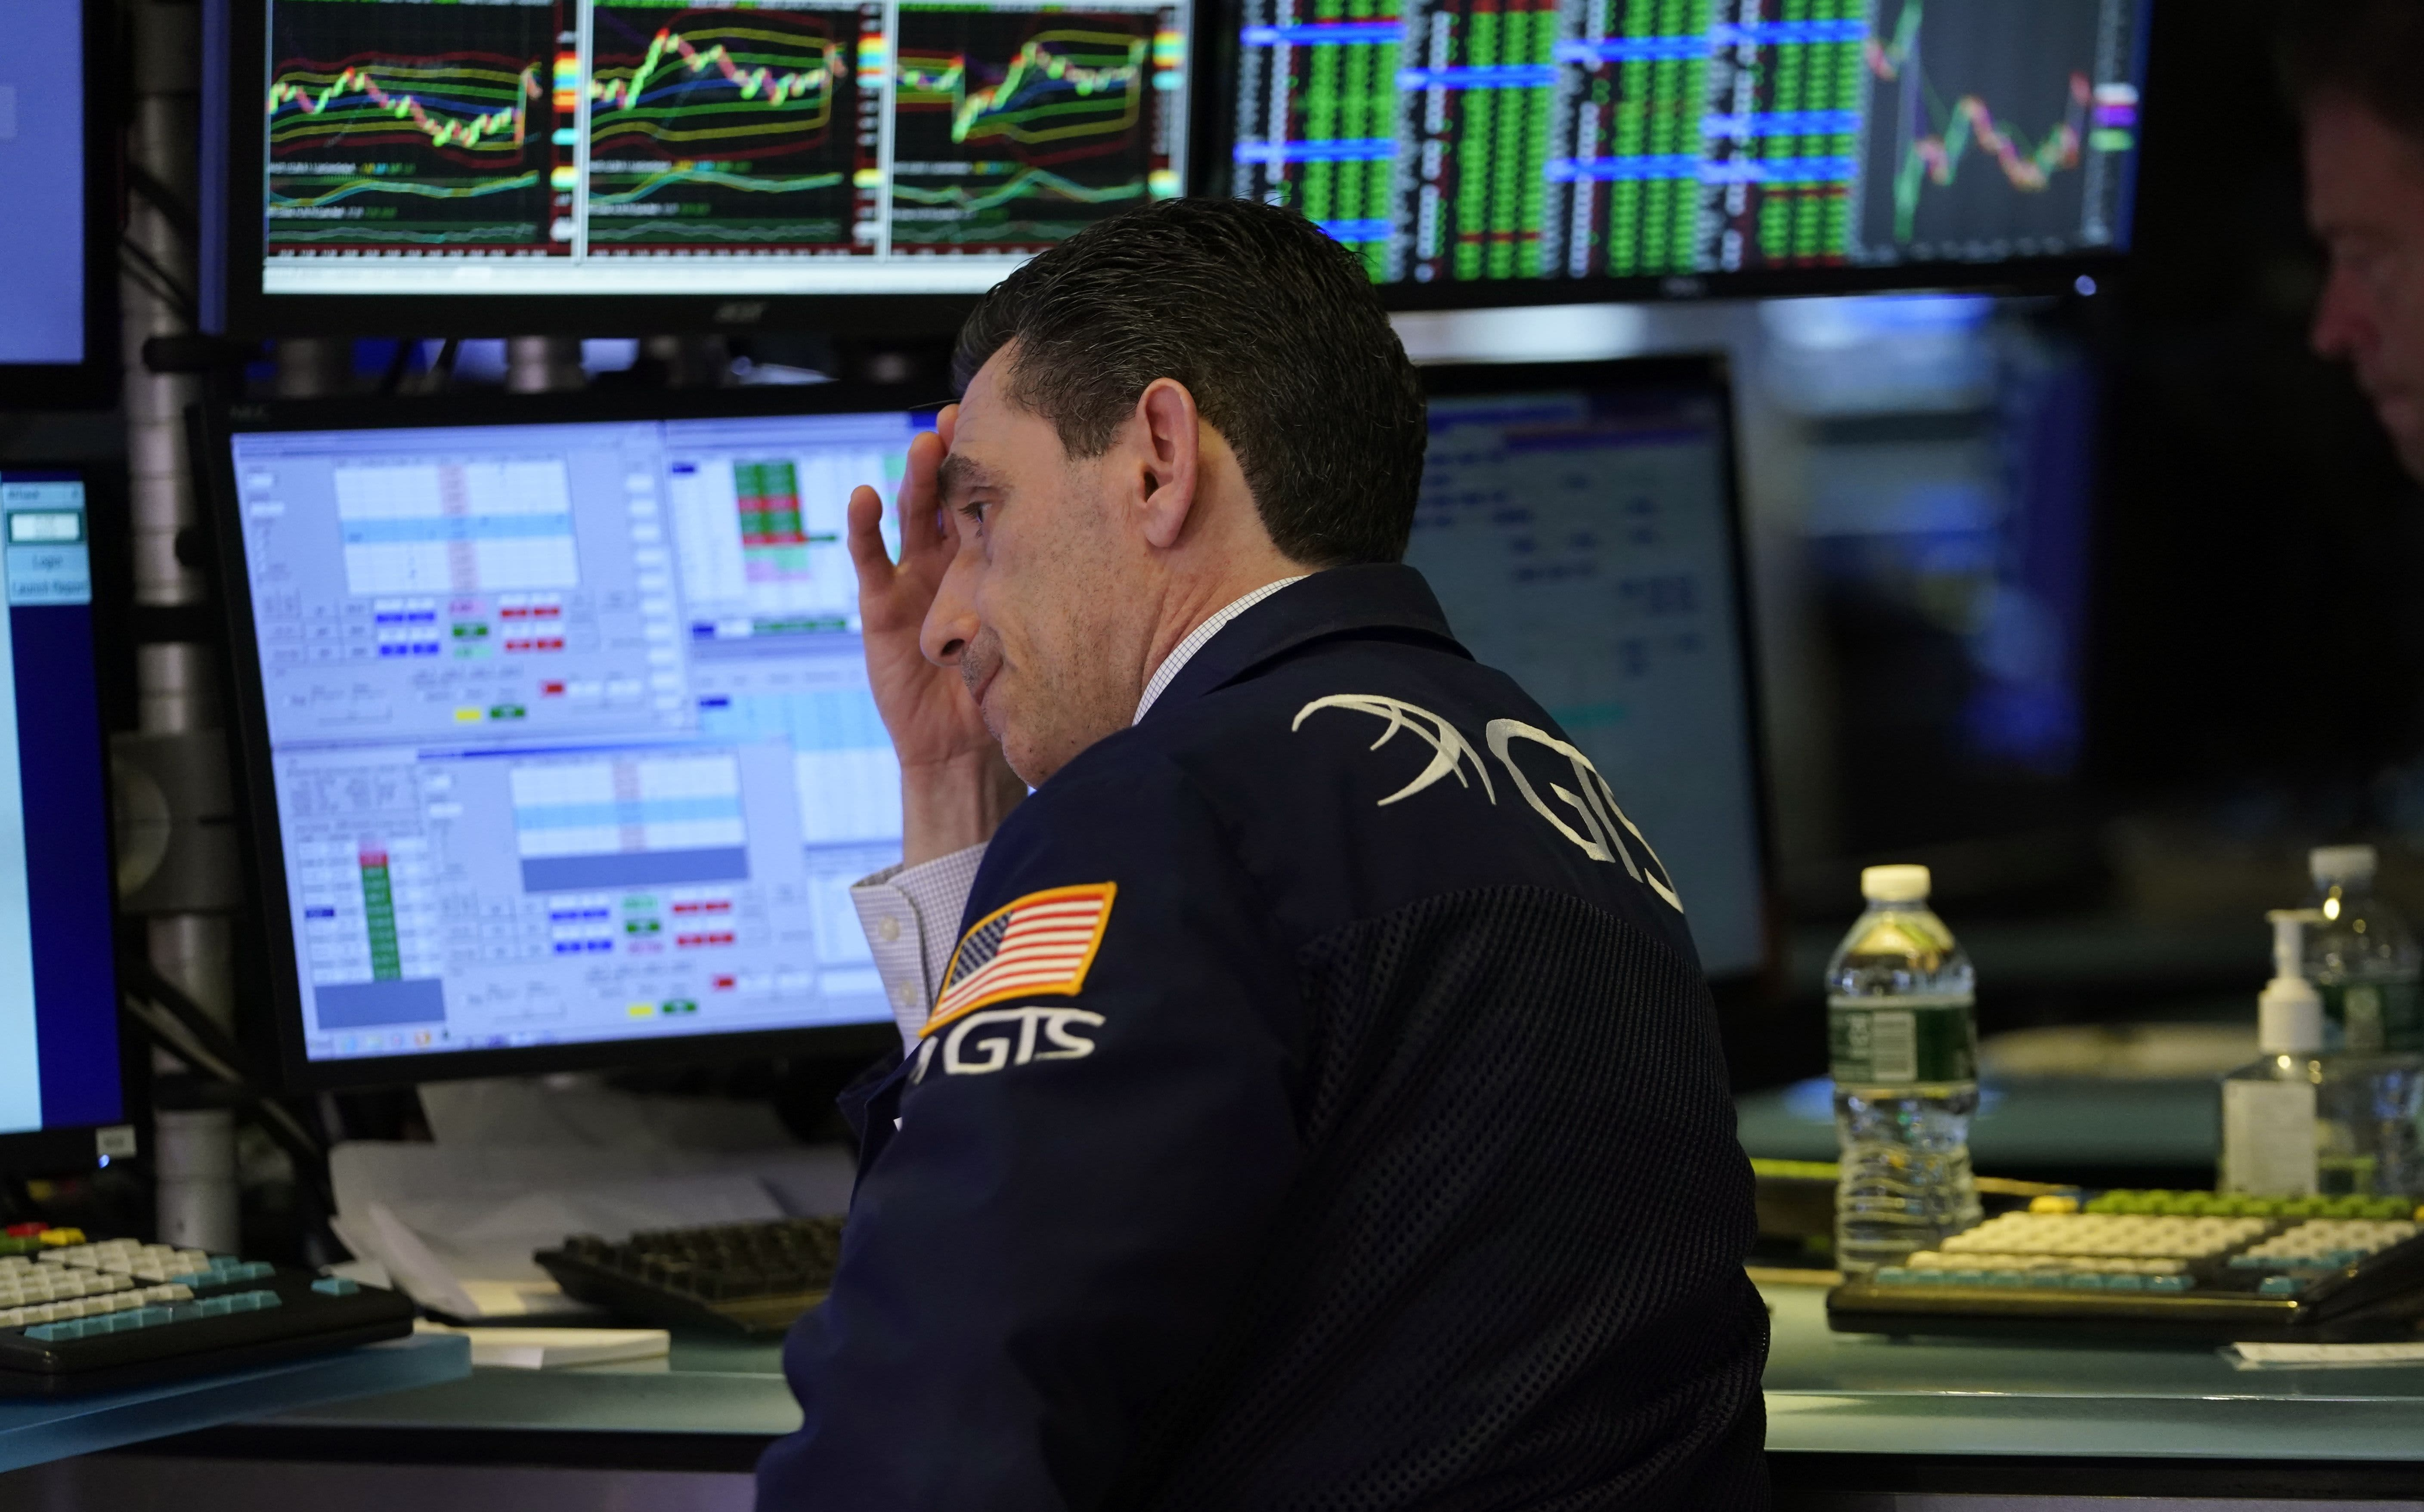 Goldman Sachs sees zero US economic growth as the coronavirus spreads